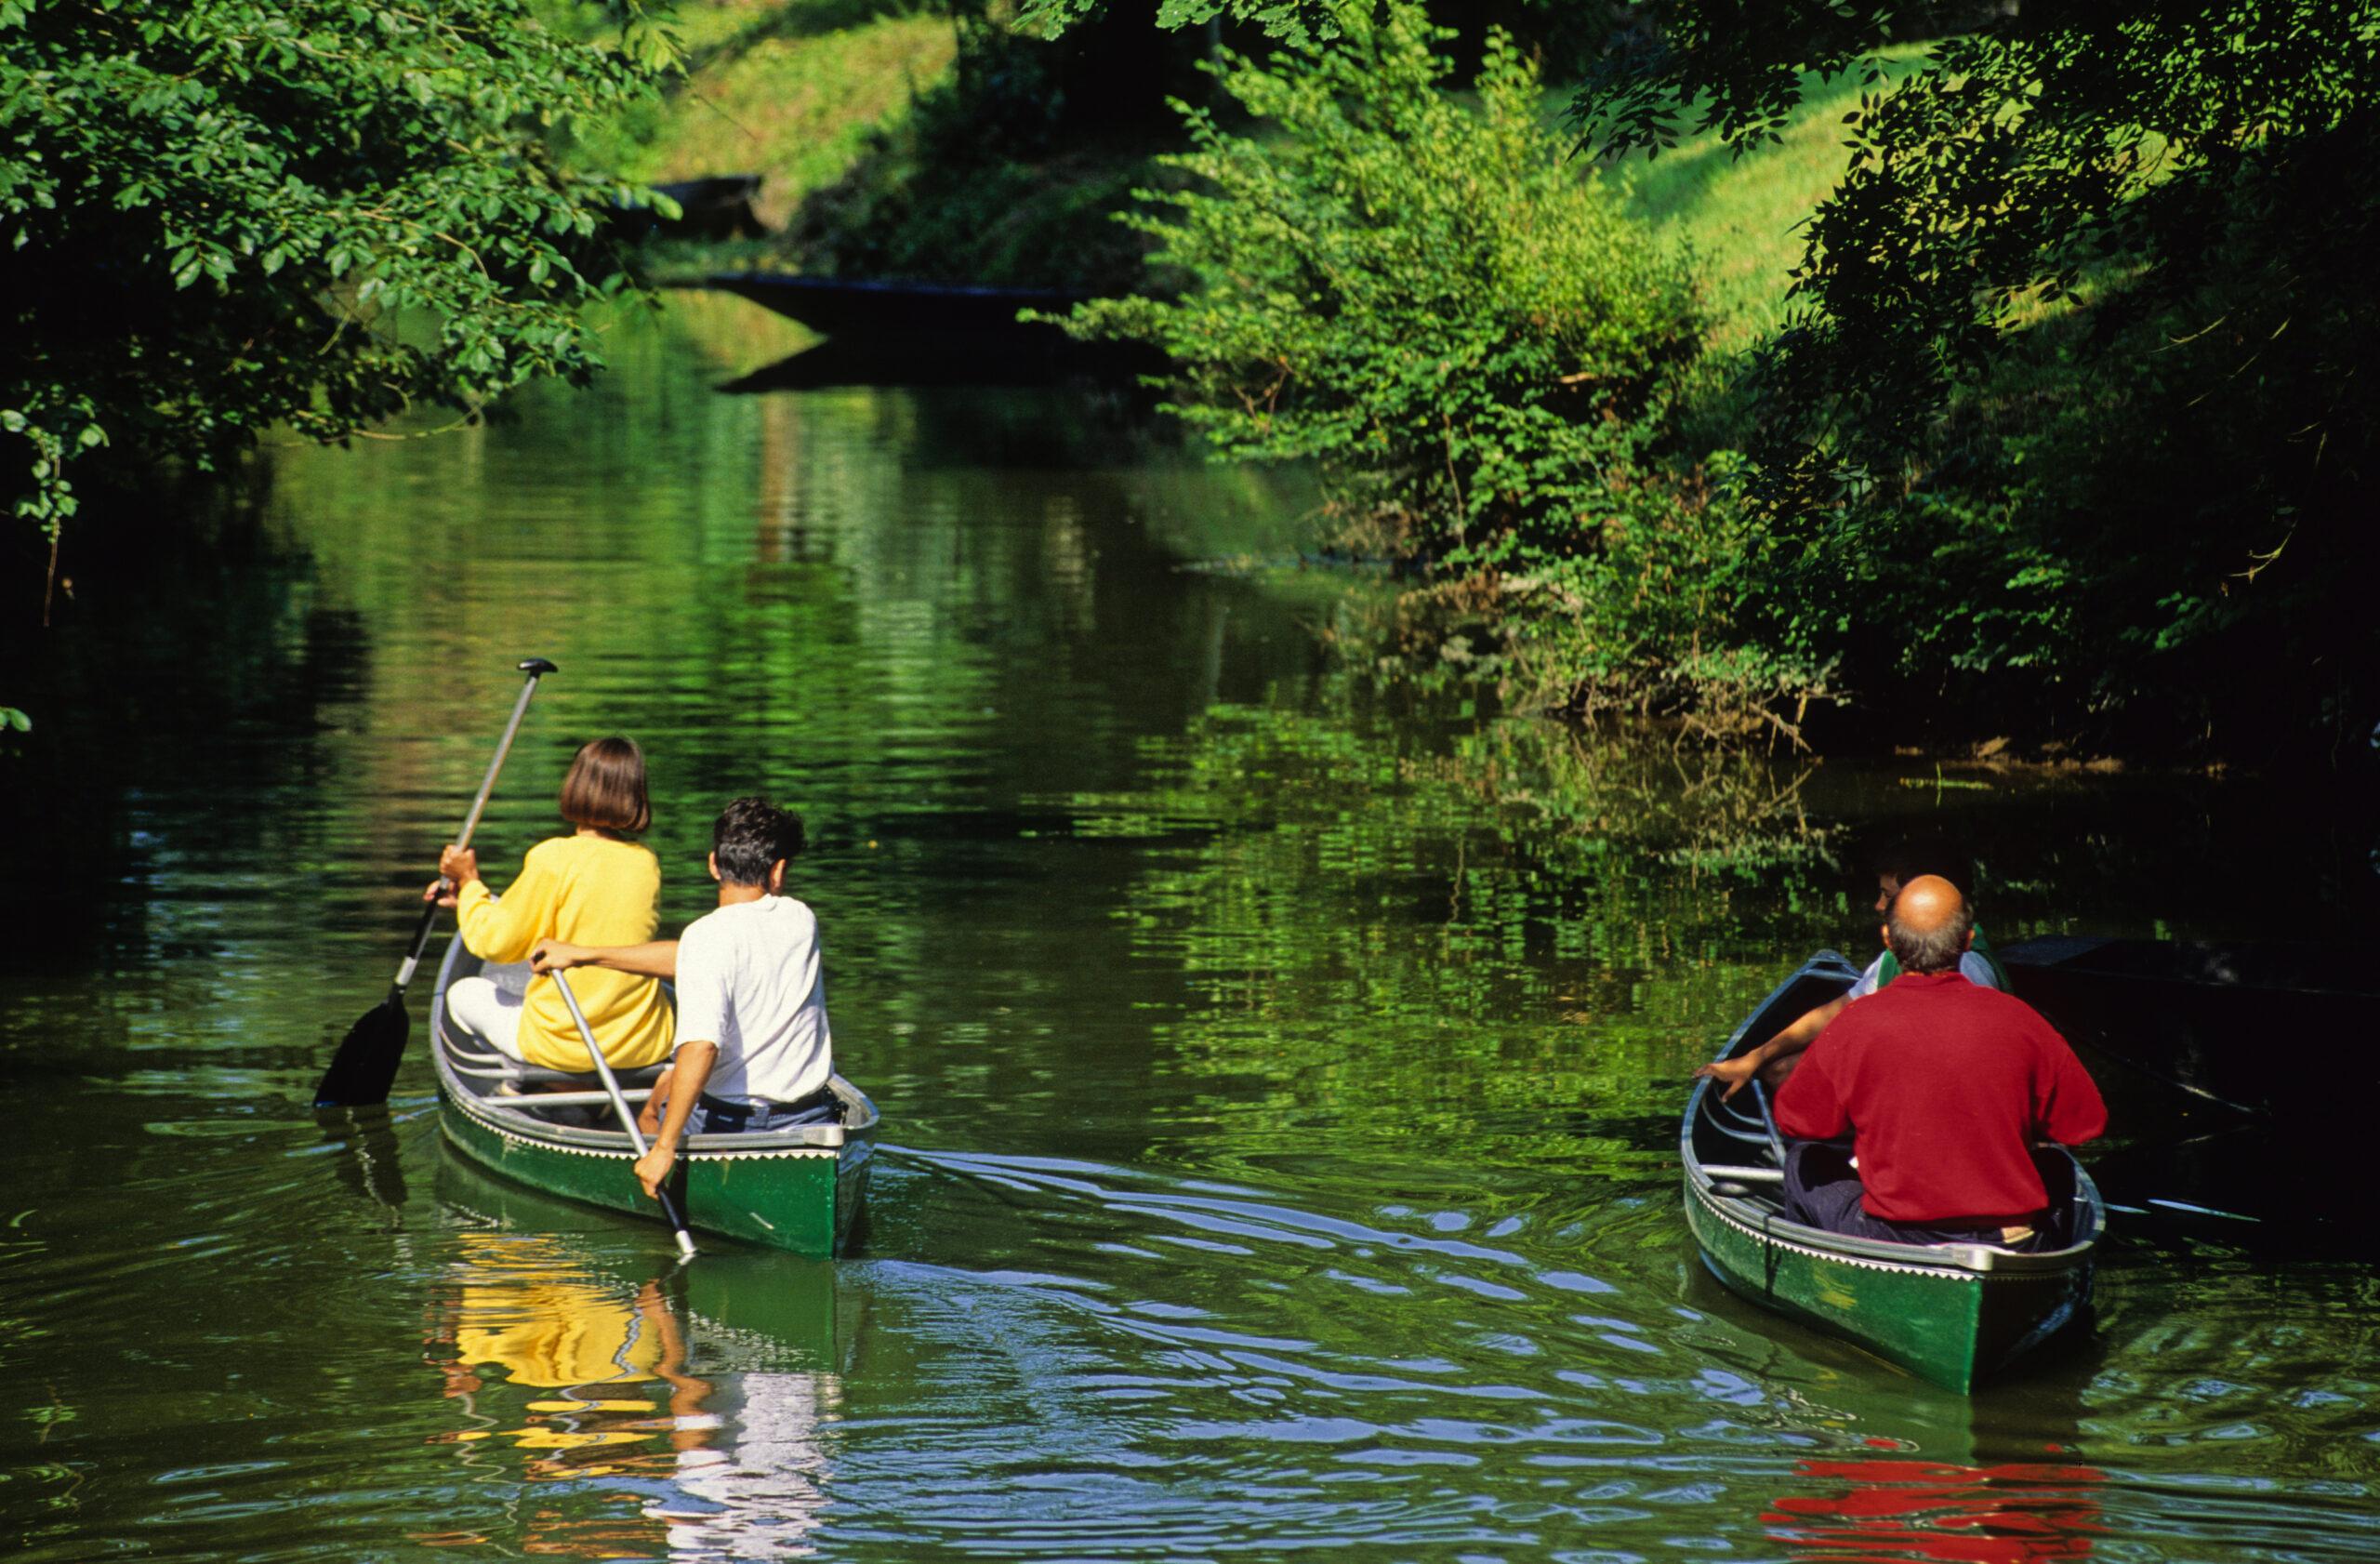 canoeing in the Marais Poitevin